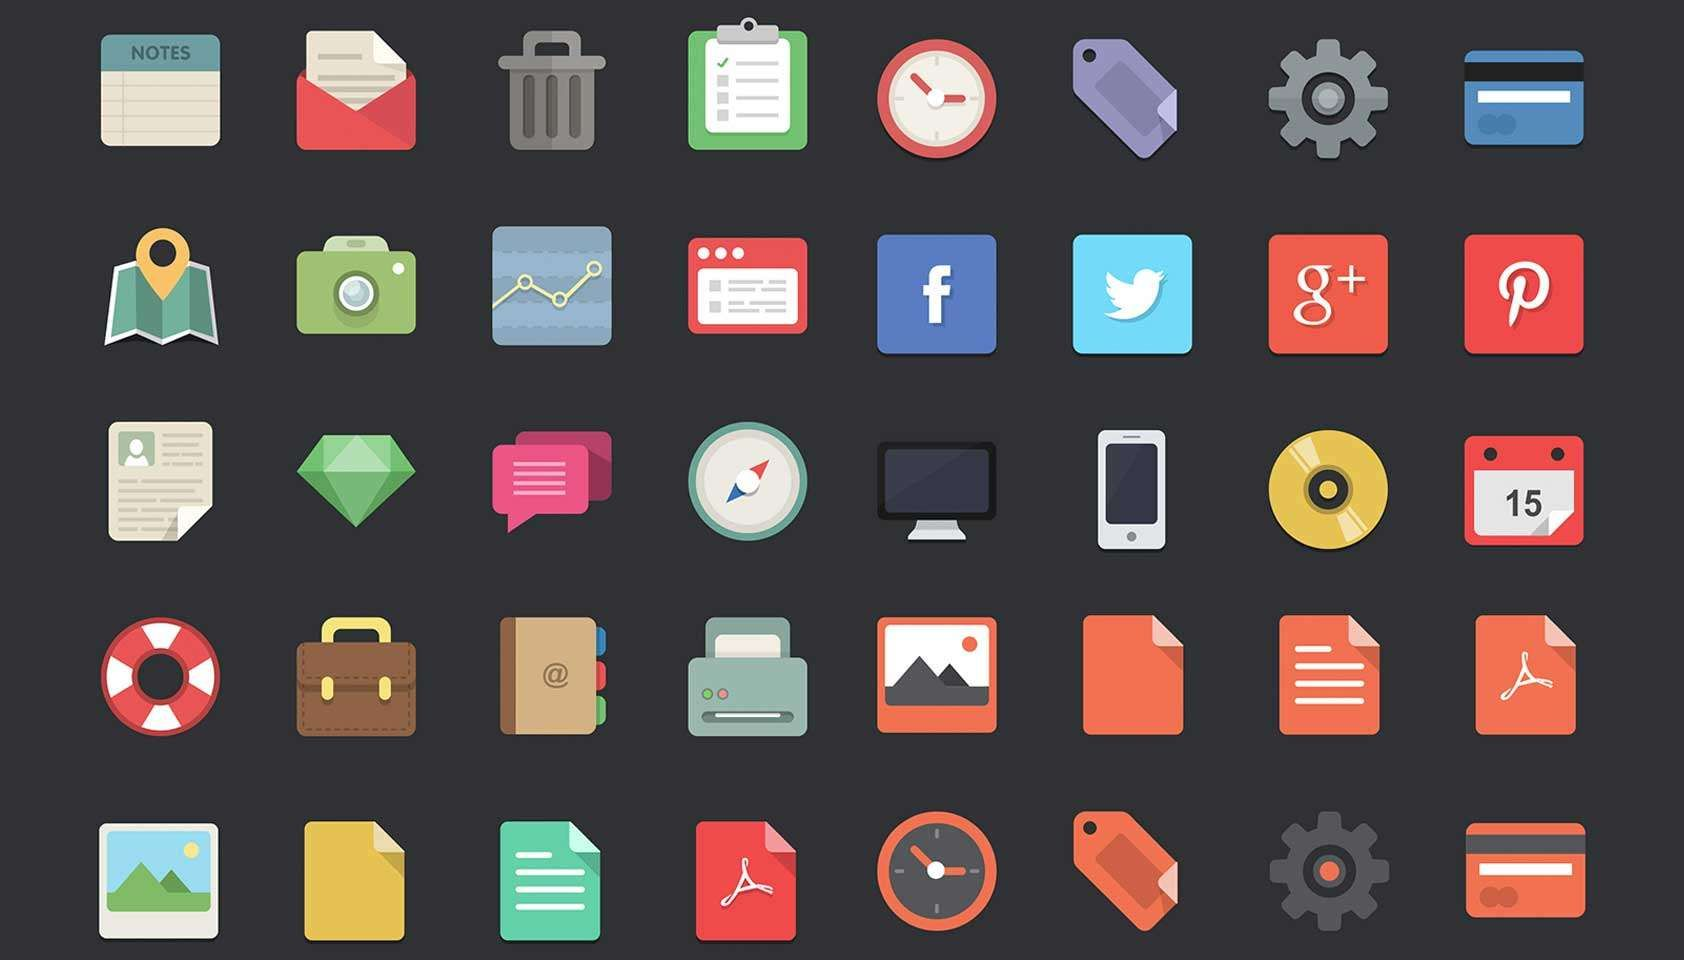 Free Download 48 Flat Designer Icons Icon Design Basic Design Principles Web Design